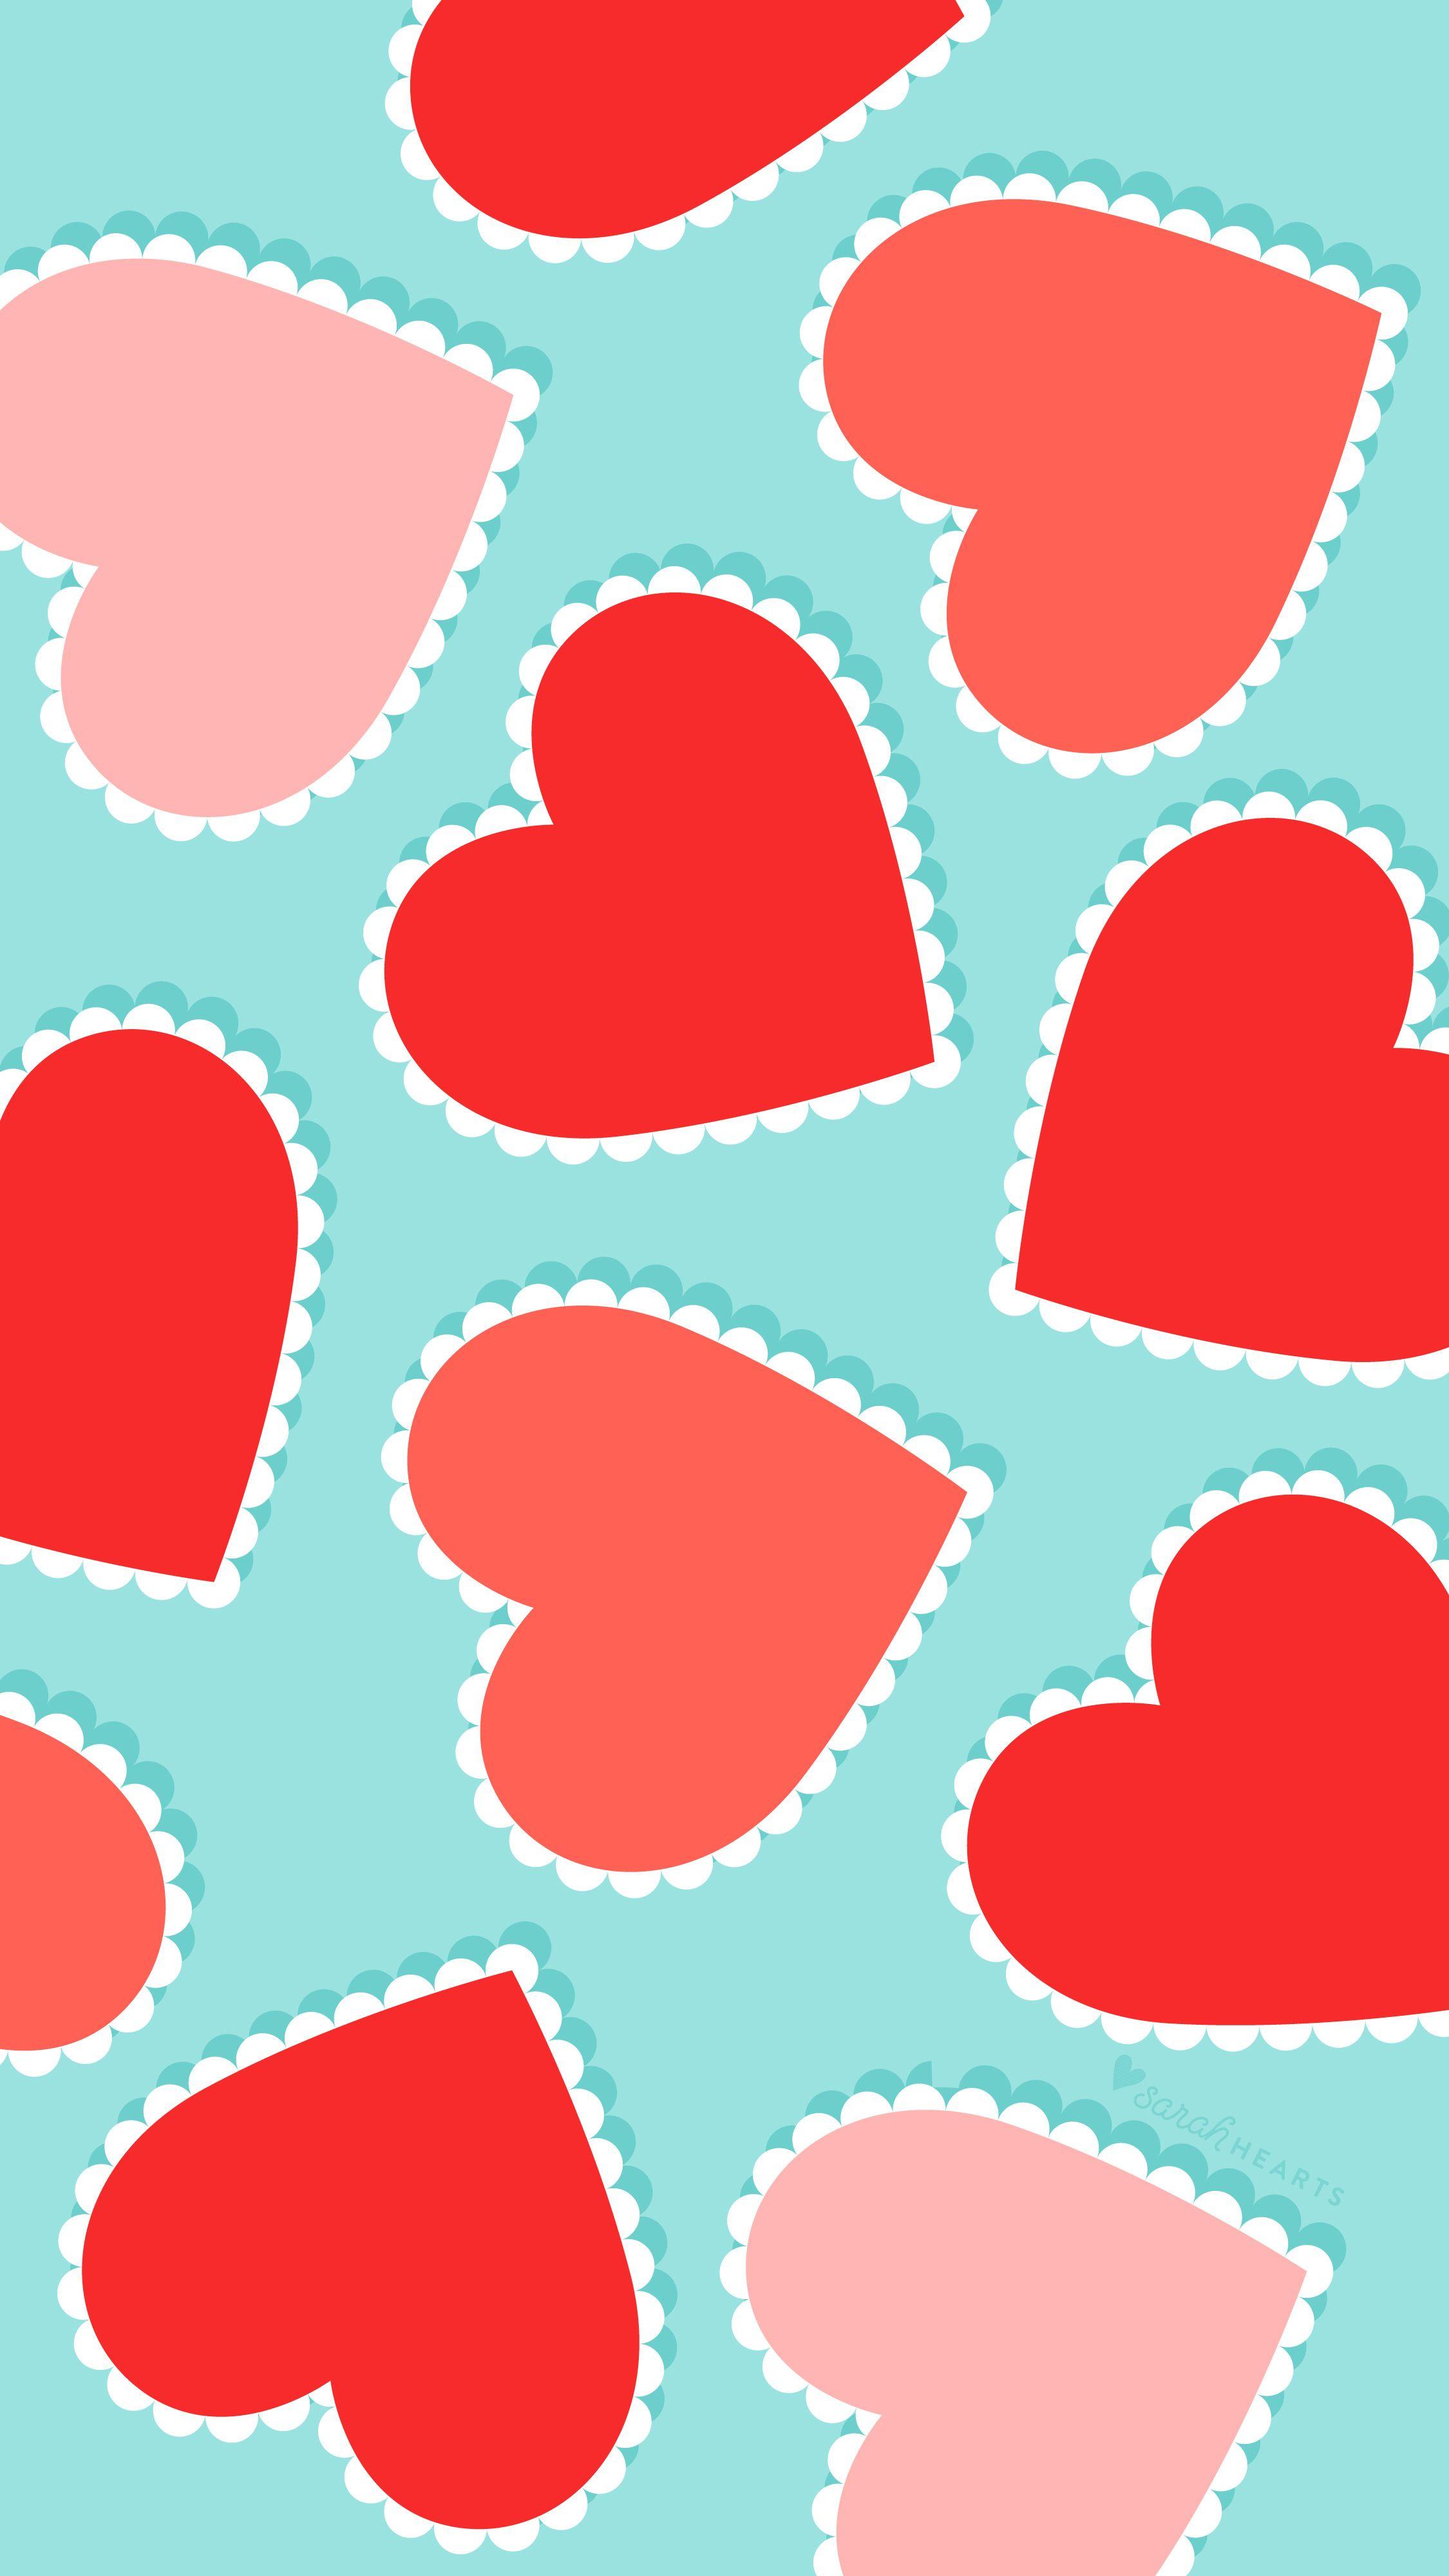 Free Scalloped Heart Valentine S Day Wallpaper Valentines